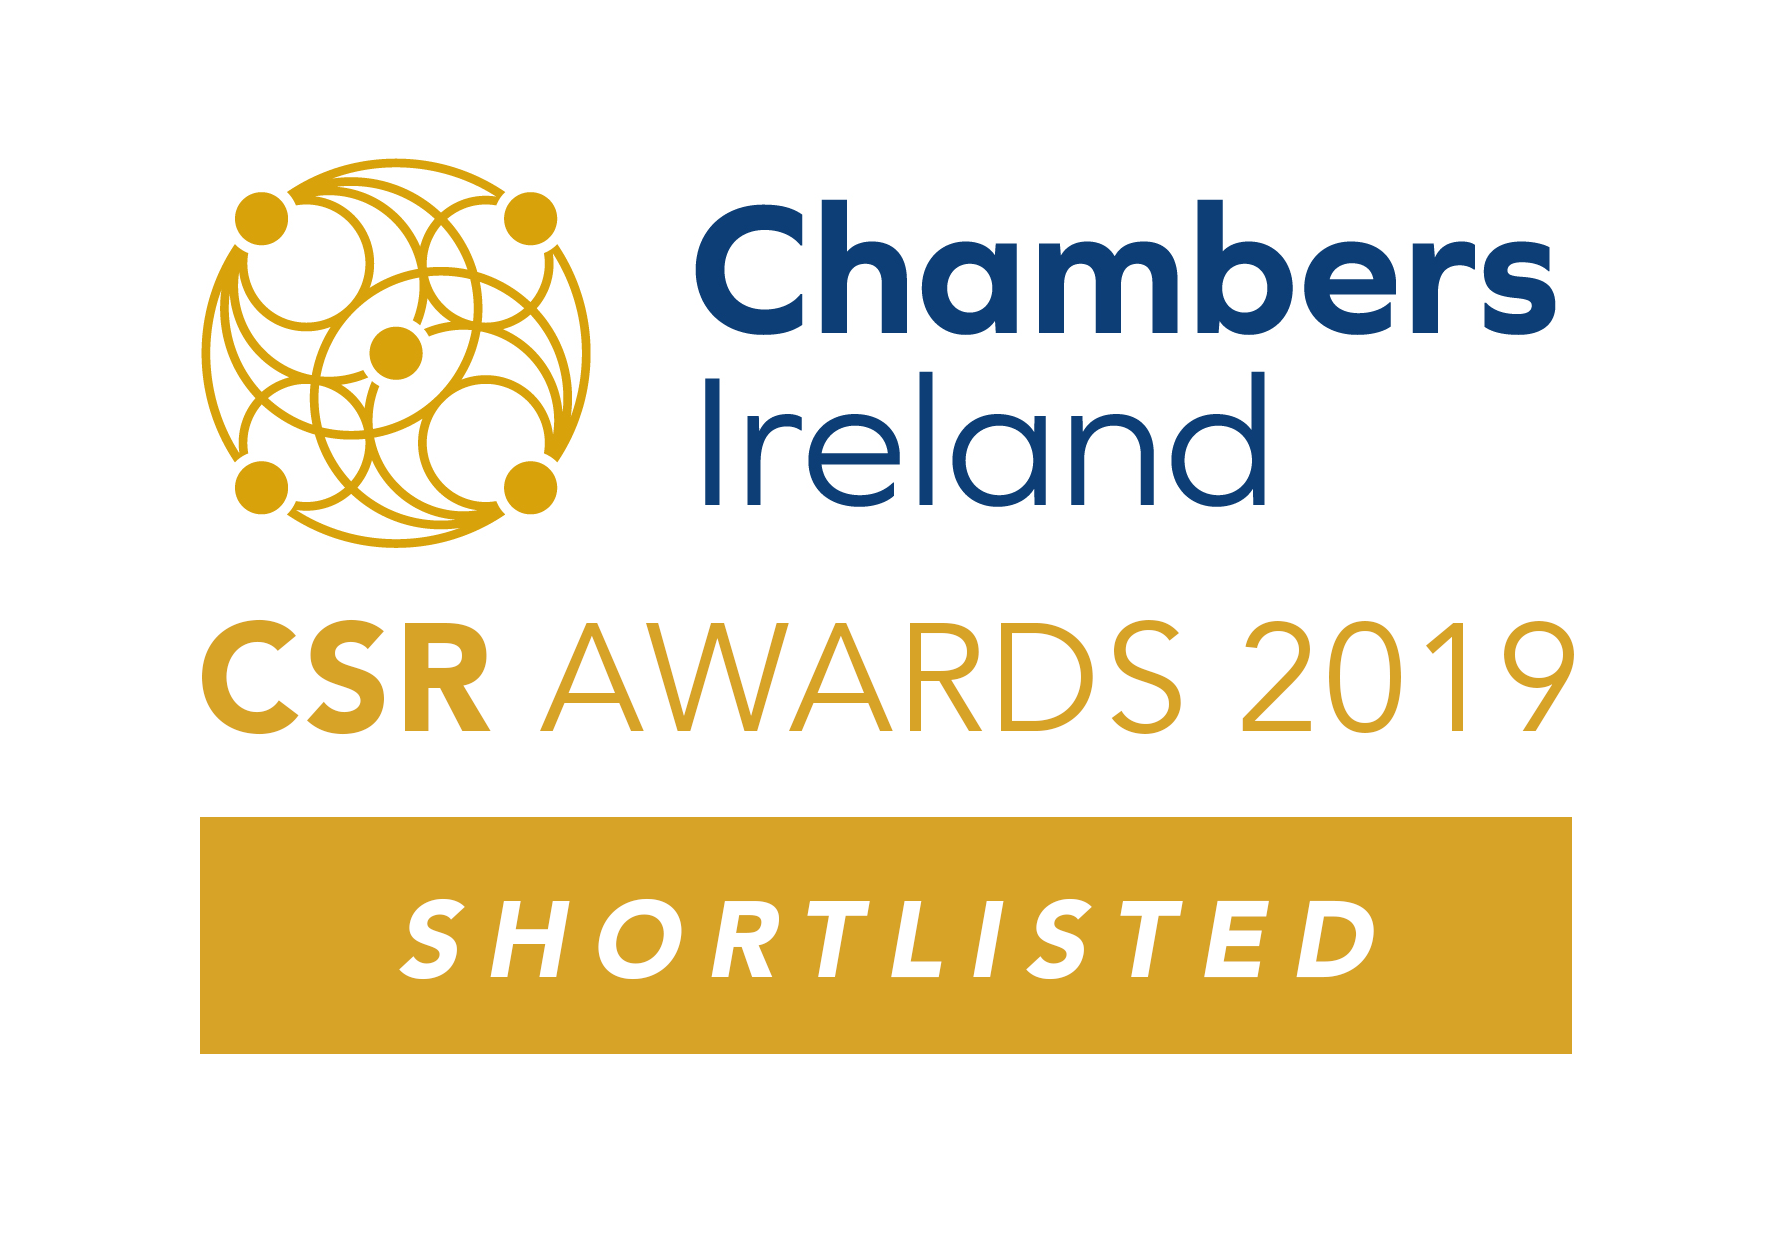 Chambers Ireland - CSR Awards 2019